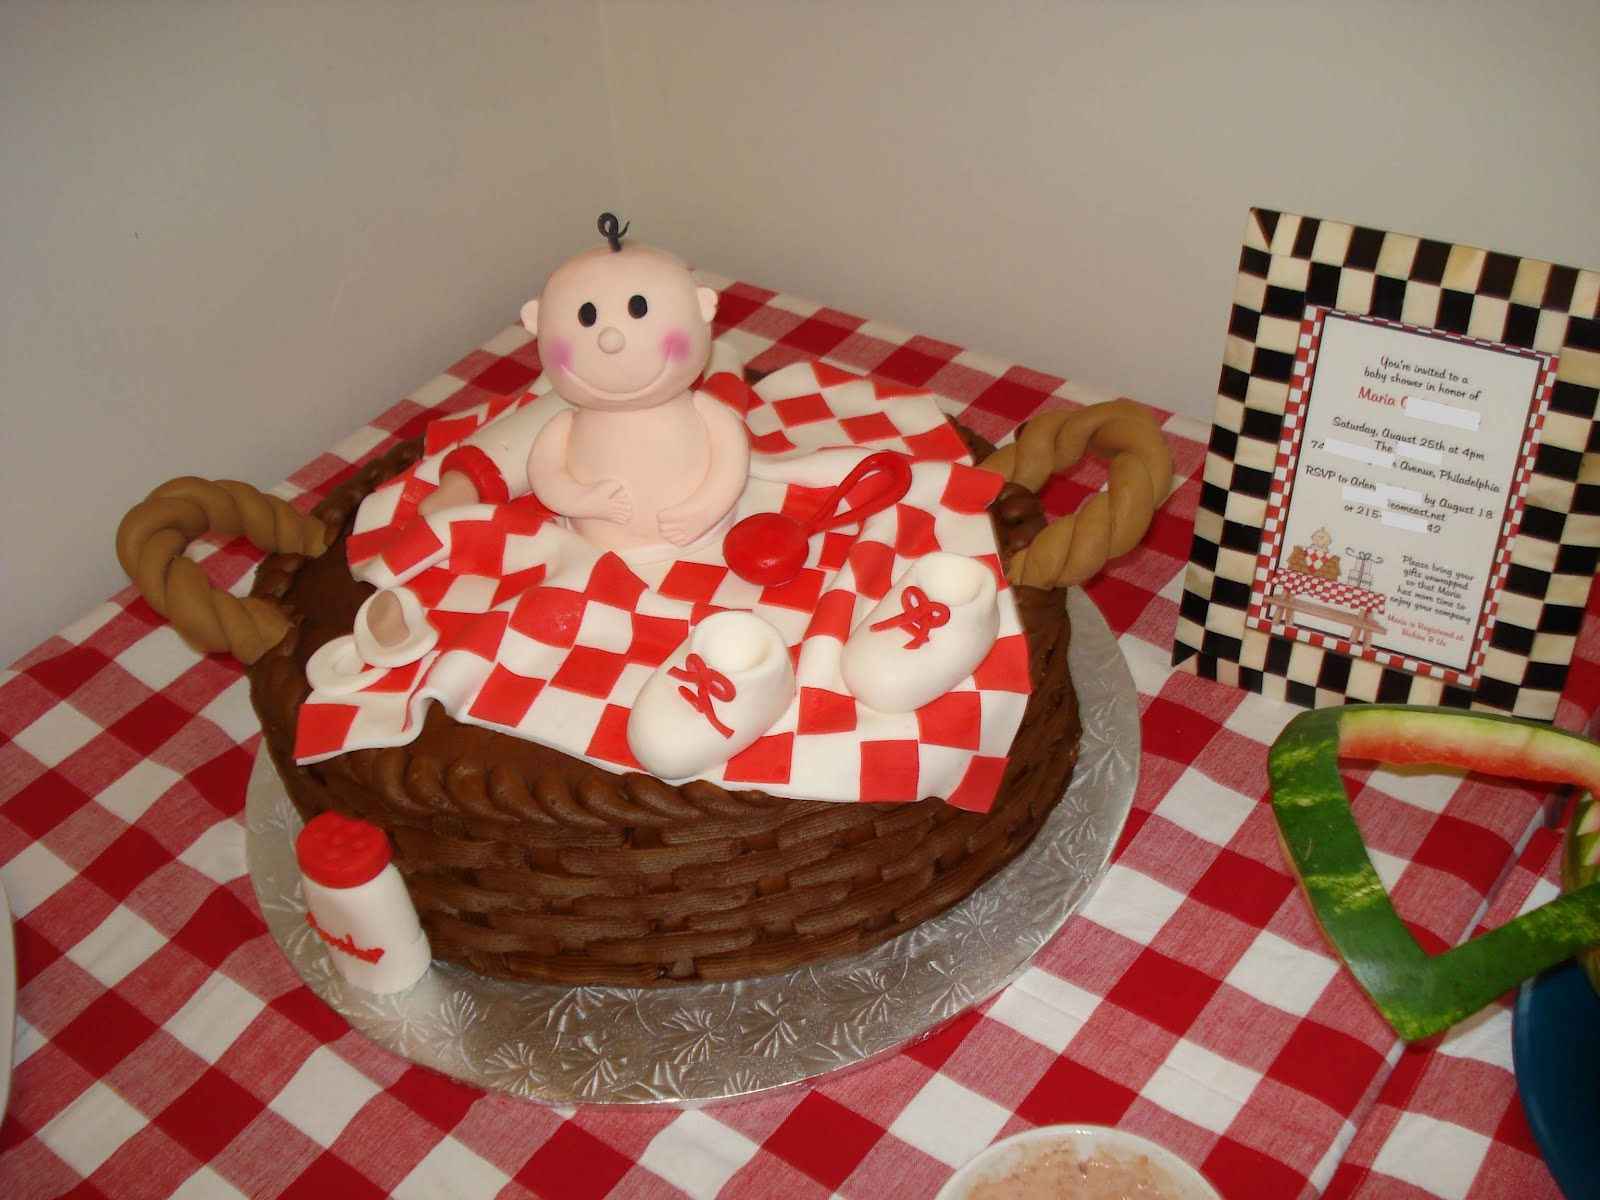 Lemon Tree Cards Blog: Baby Q Shower Cake to match invitation!